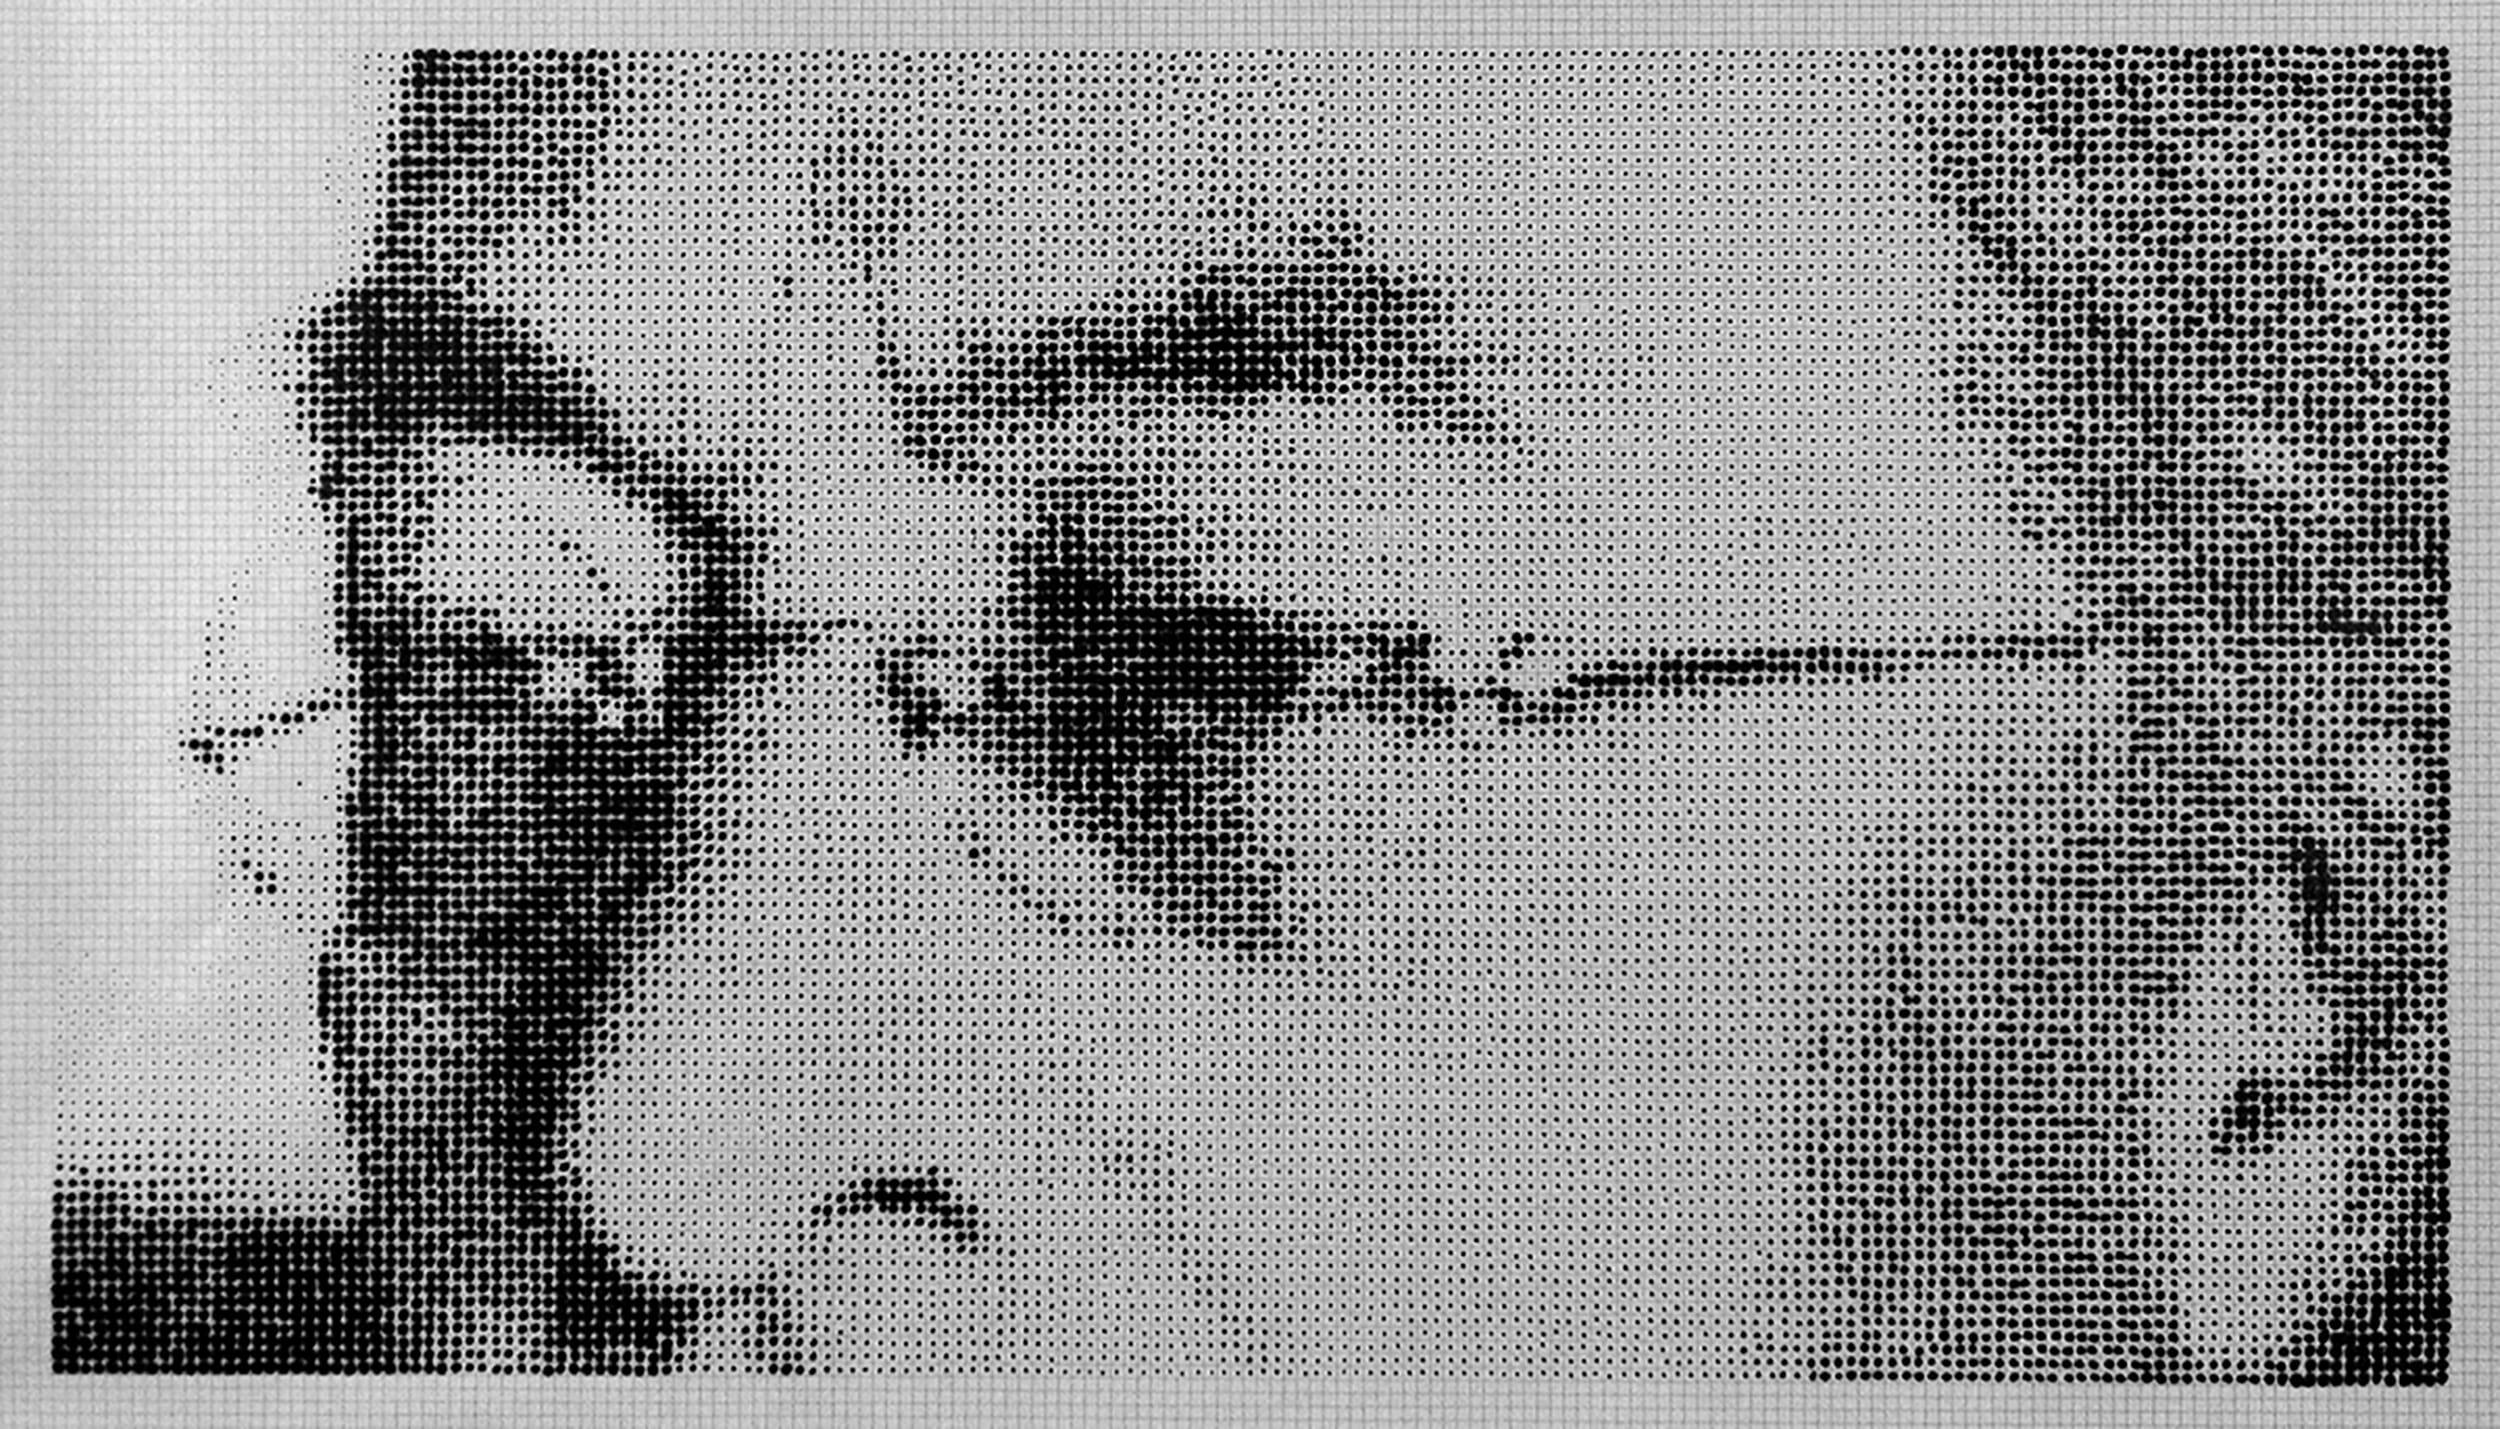 drawing dots ink kandinsky esteban peña art